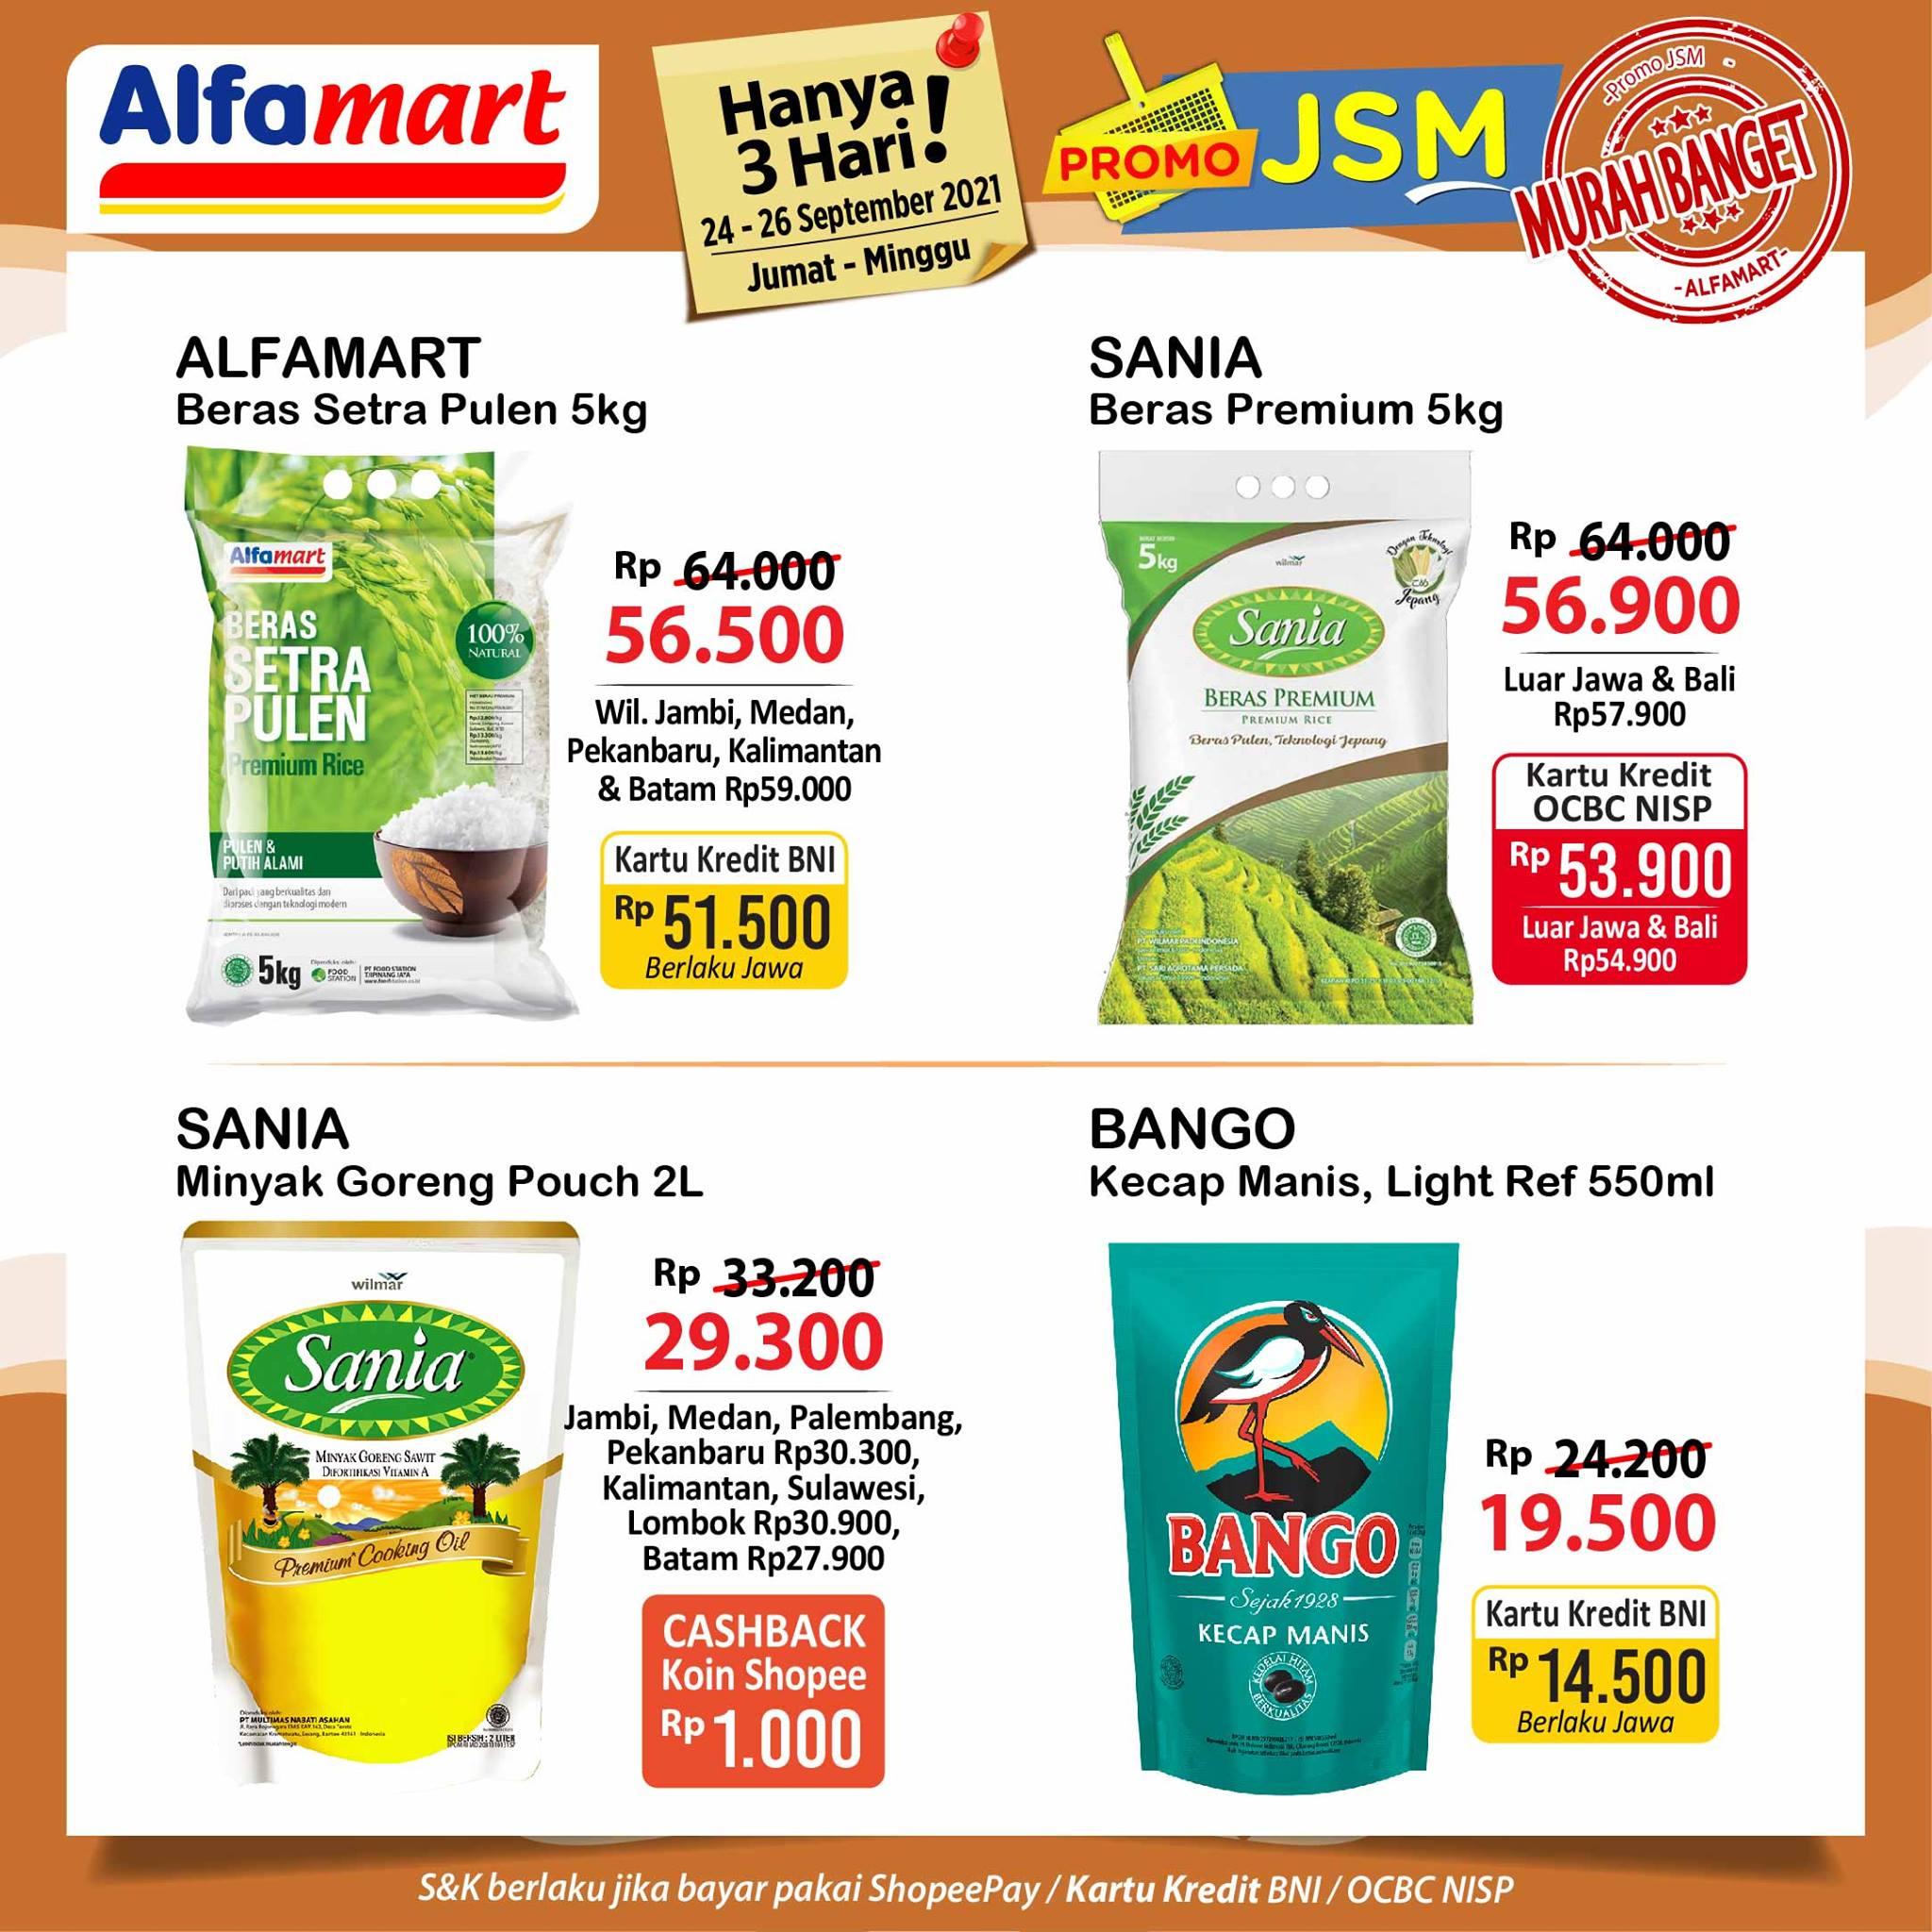 Promo ALFAMART JSM Weekend periode 24-26 September 2021